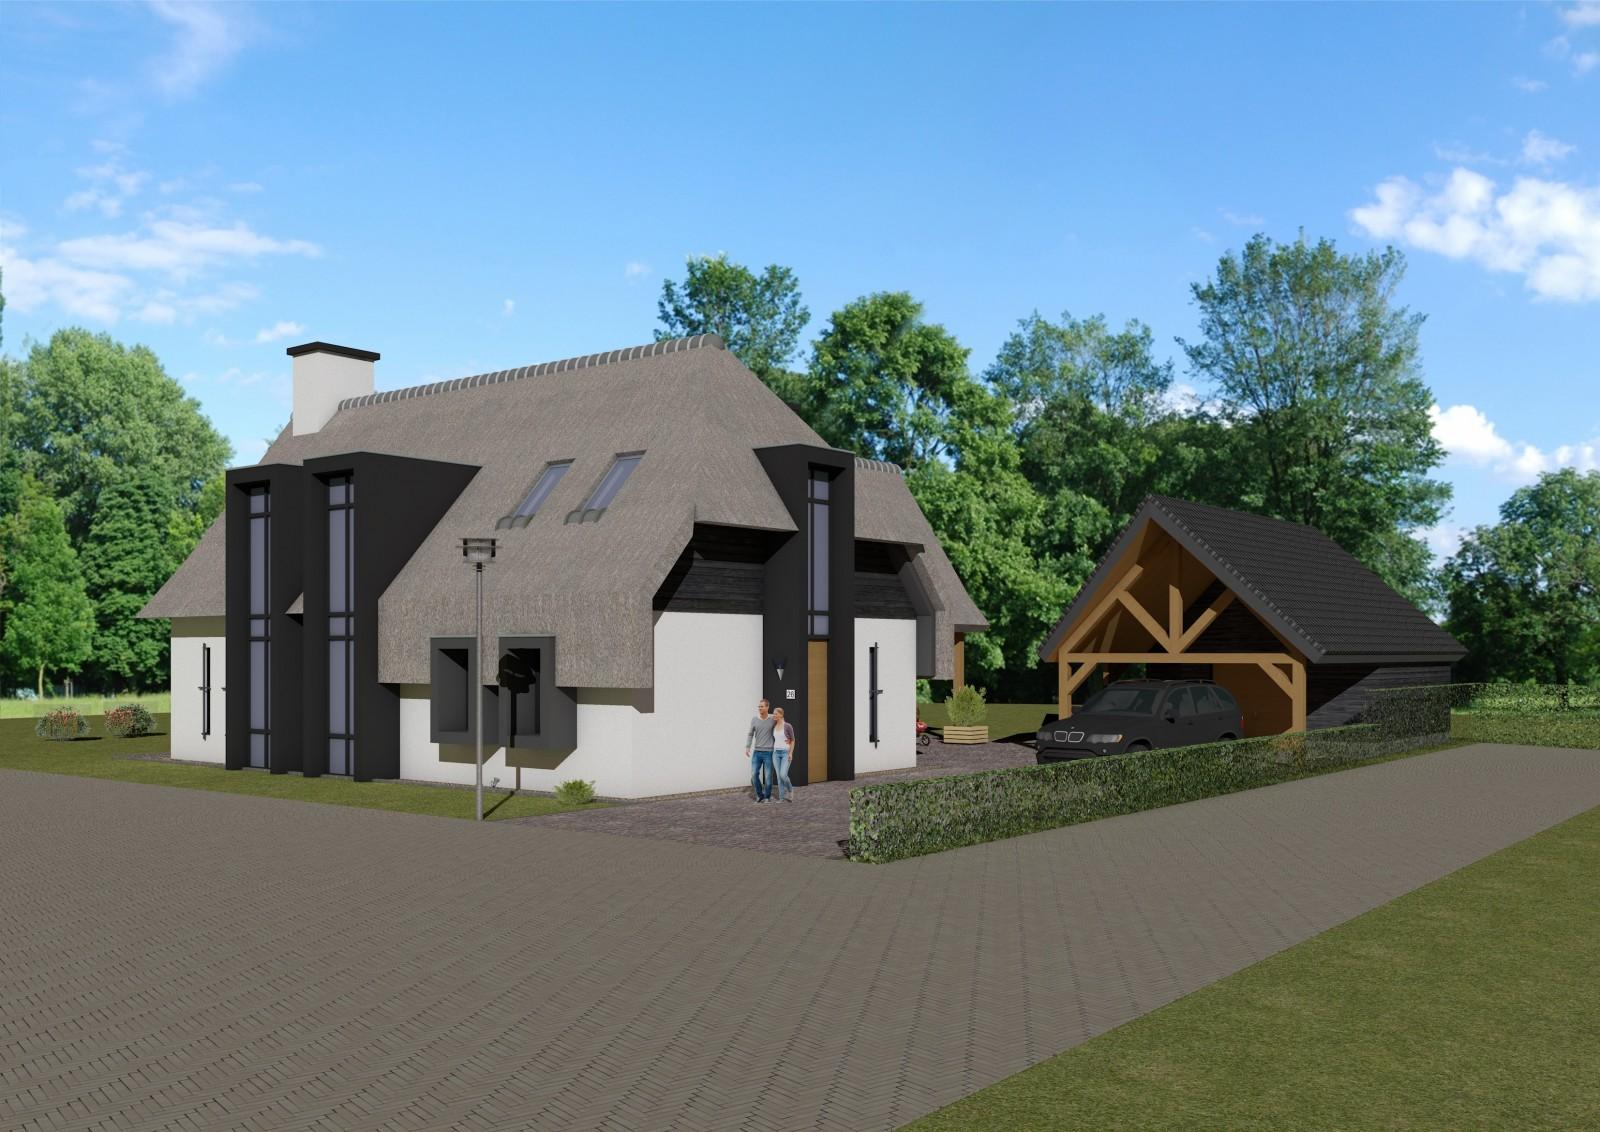 Nieuwbouw moderne landelijke woning bouwkundig tekenburo donkers relou - Zeer moderne woning ...